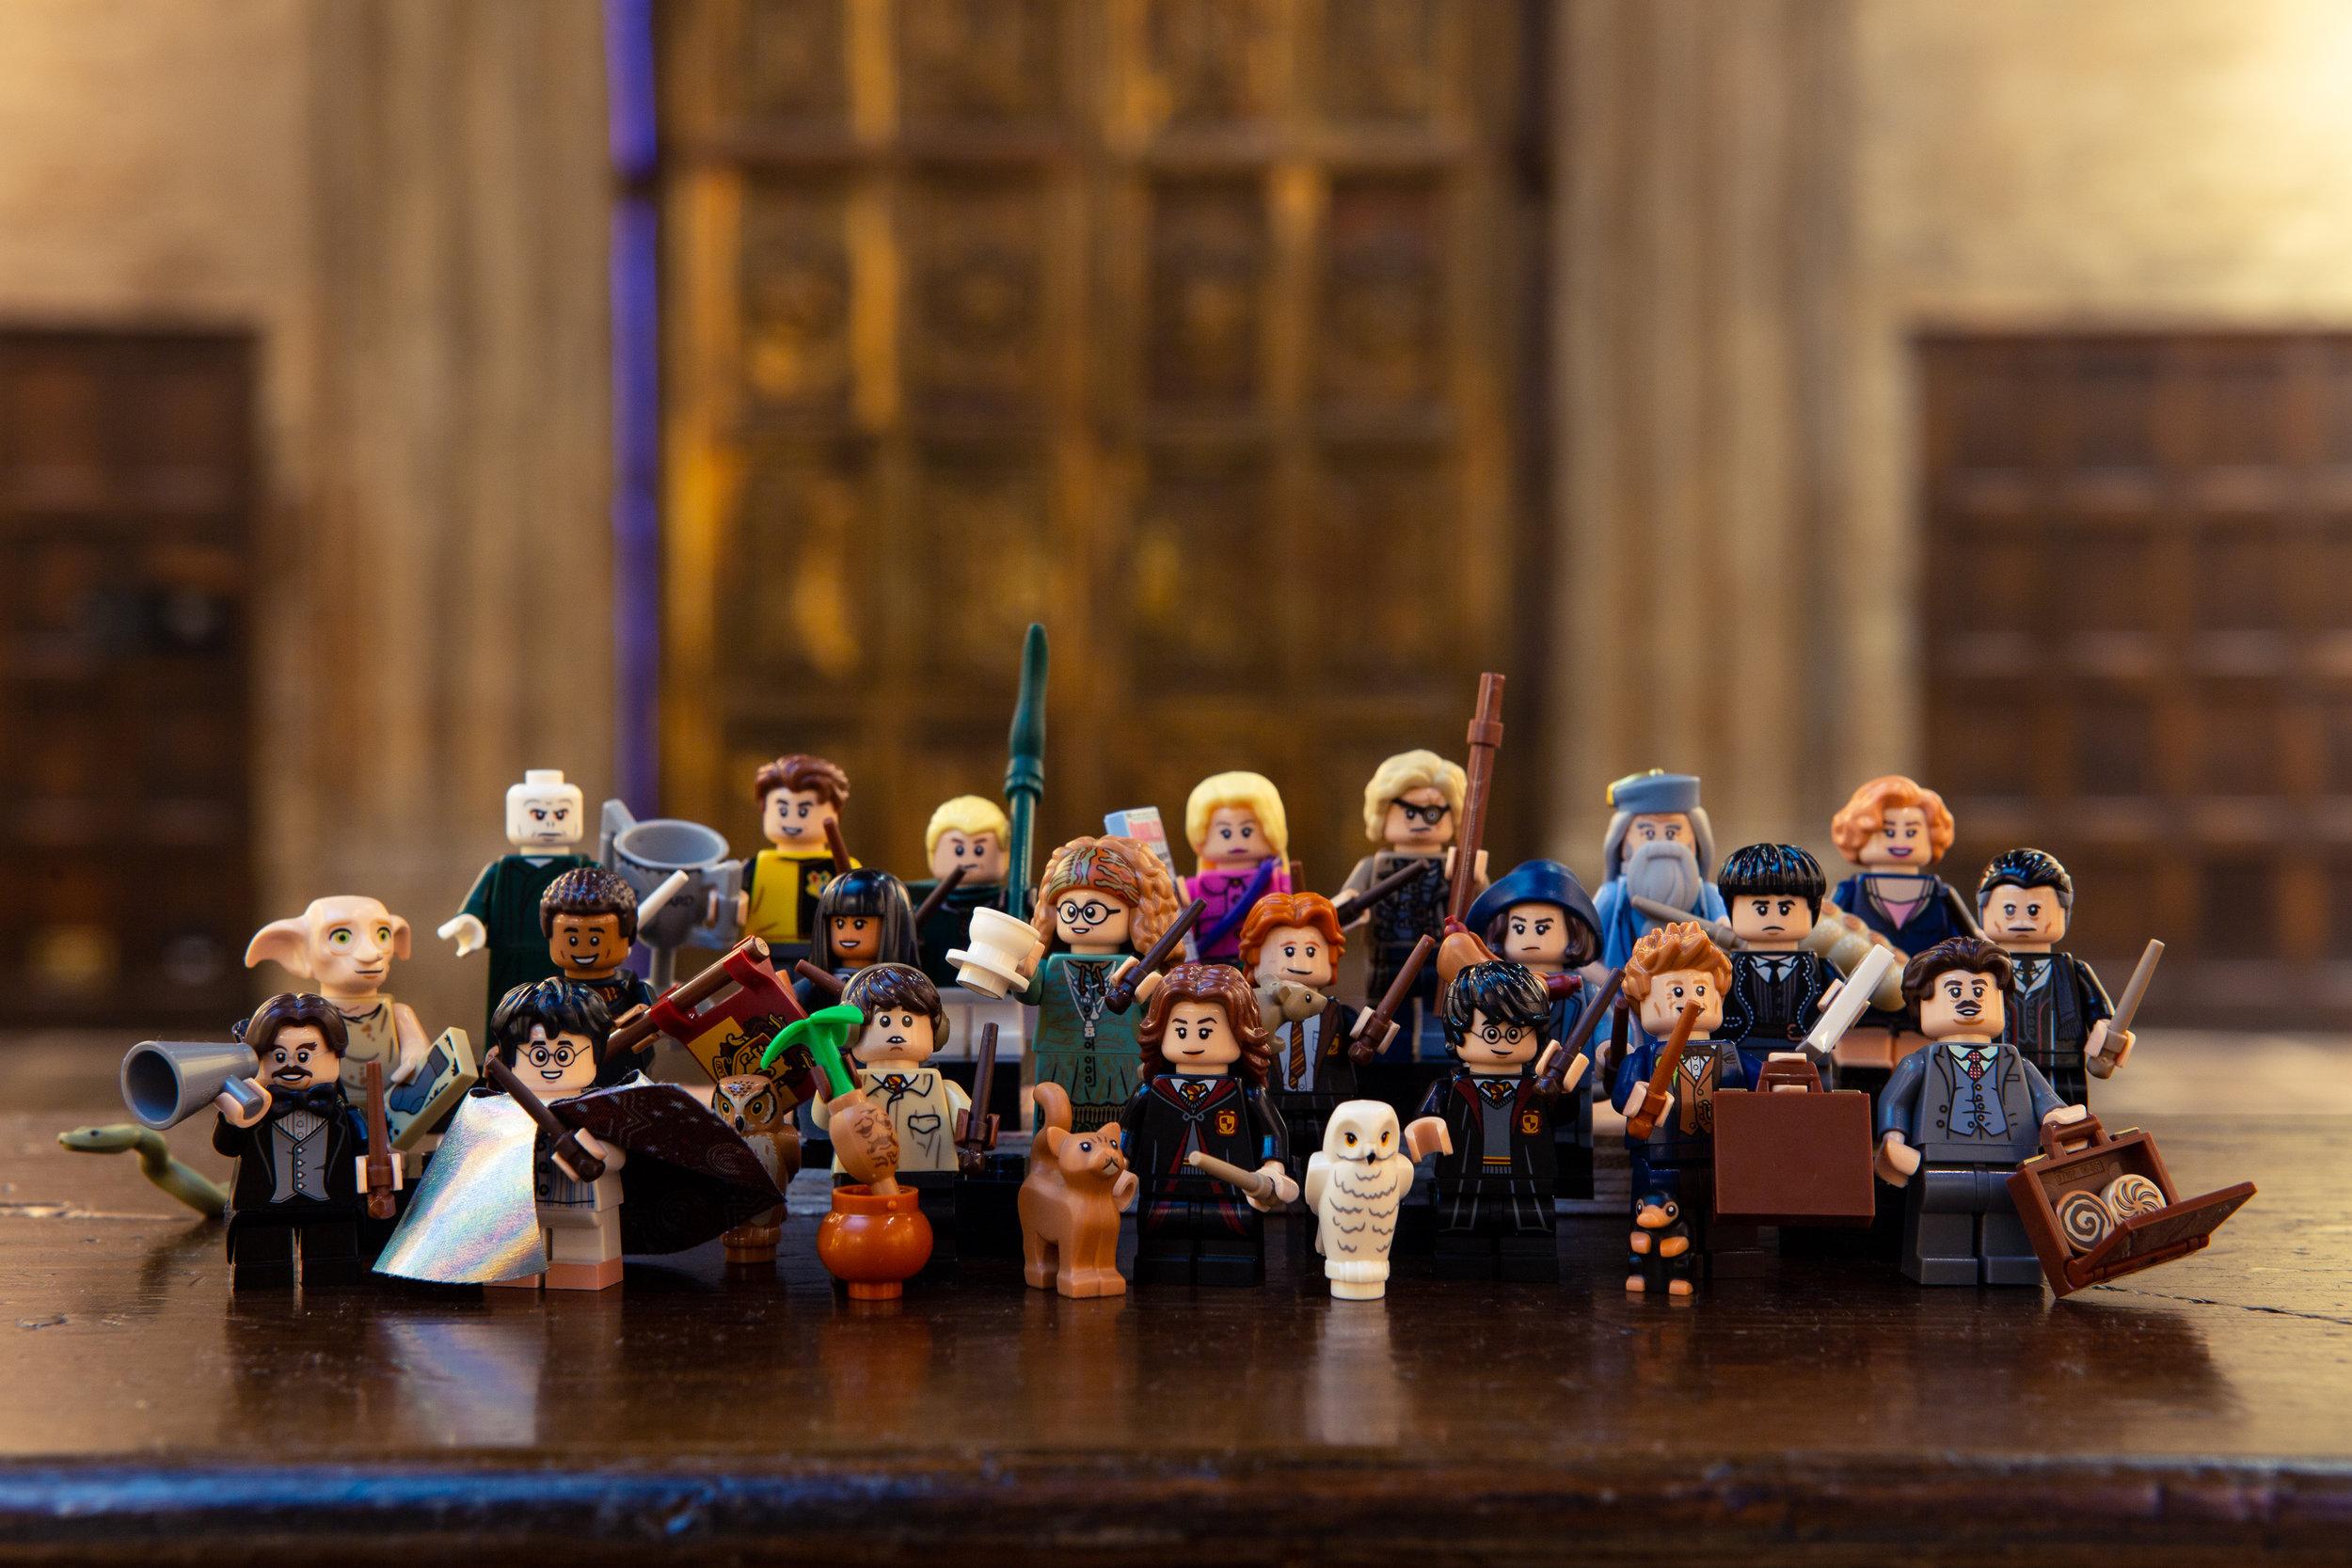 LEGO_WBST_19.06.18_hi-res-2.jpg